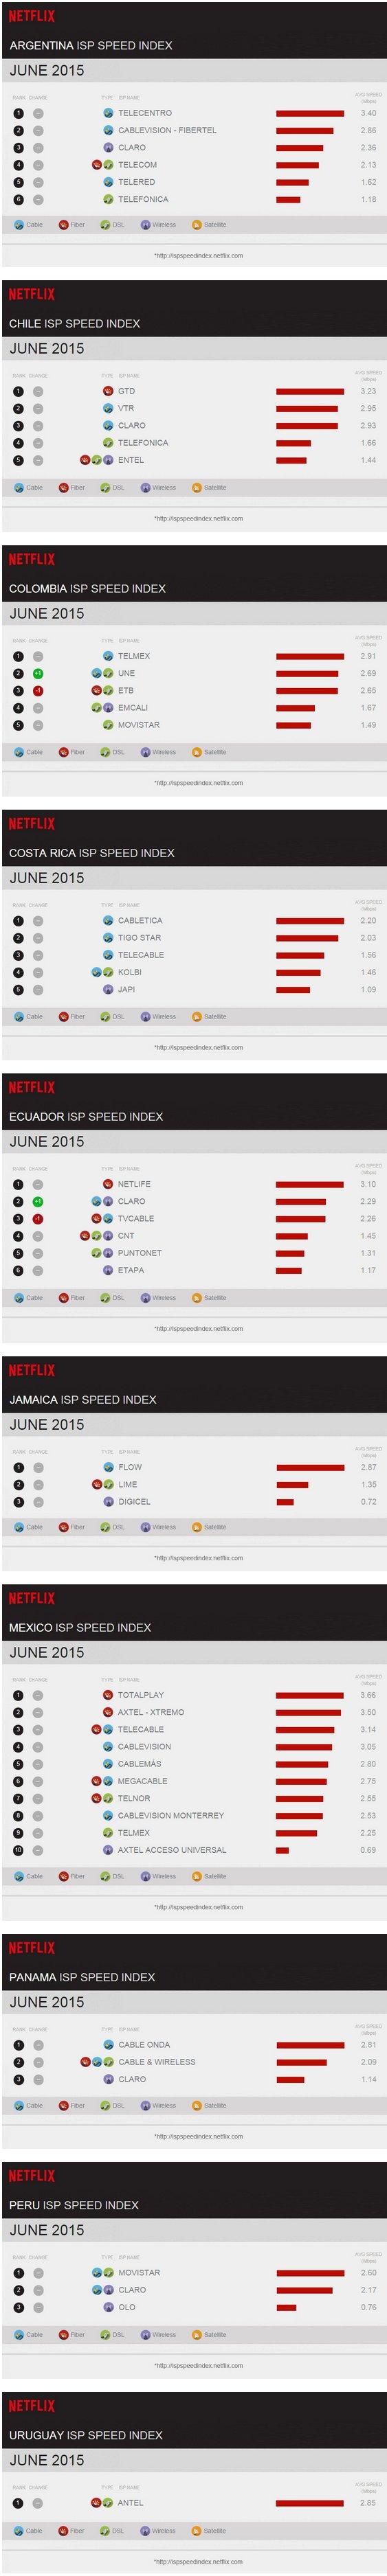 netflix-indice-velocidad-isp-latinoamerica